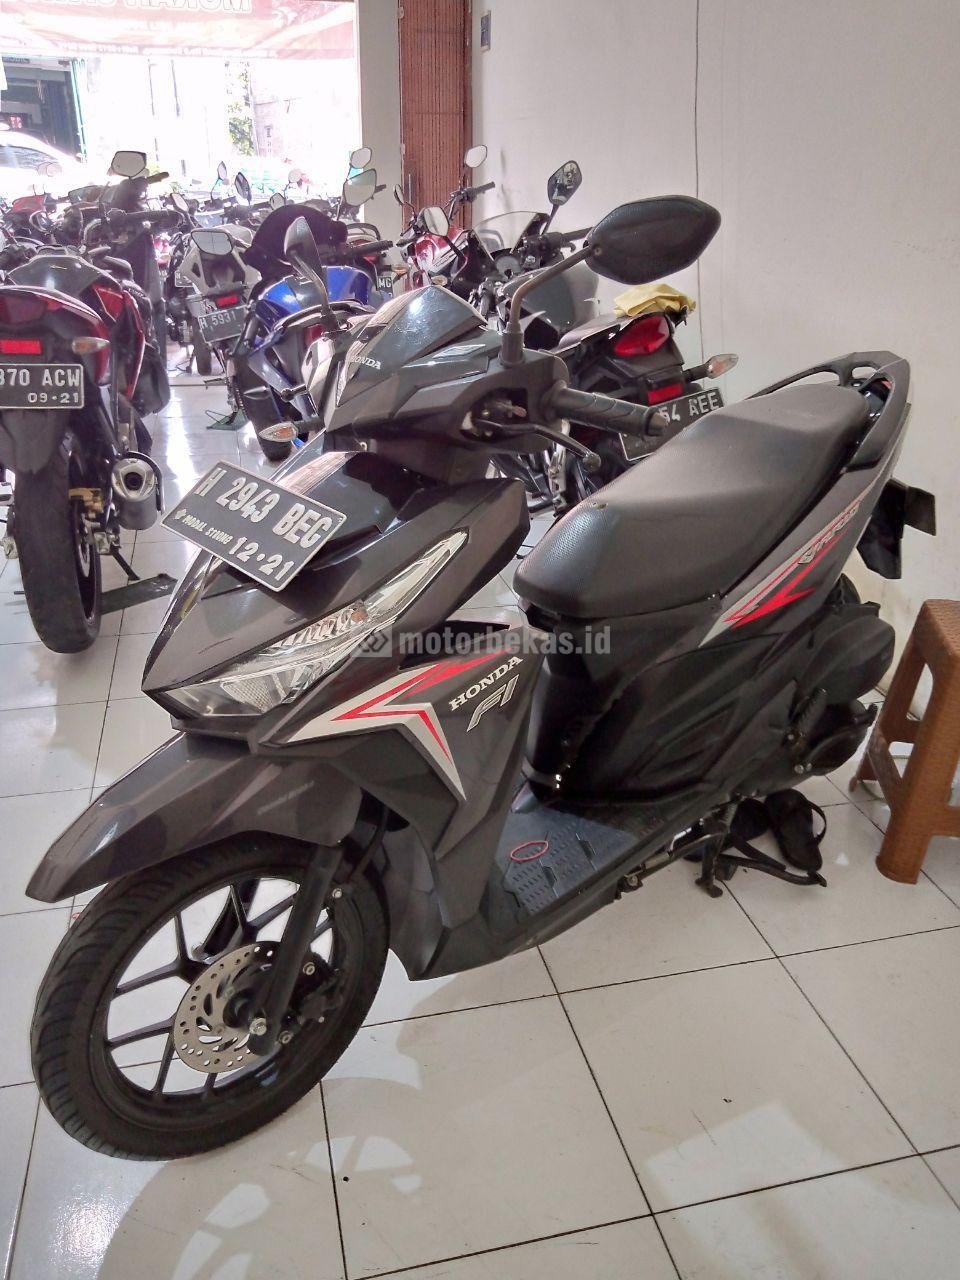 HONDA VARIO TECHNO 125  2082 motorbekas.id